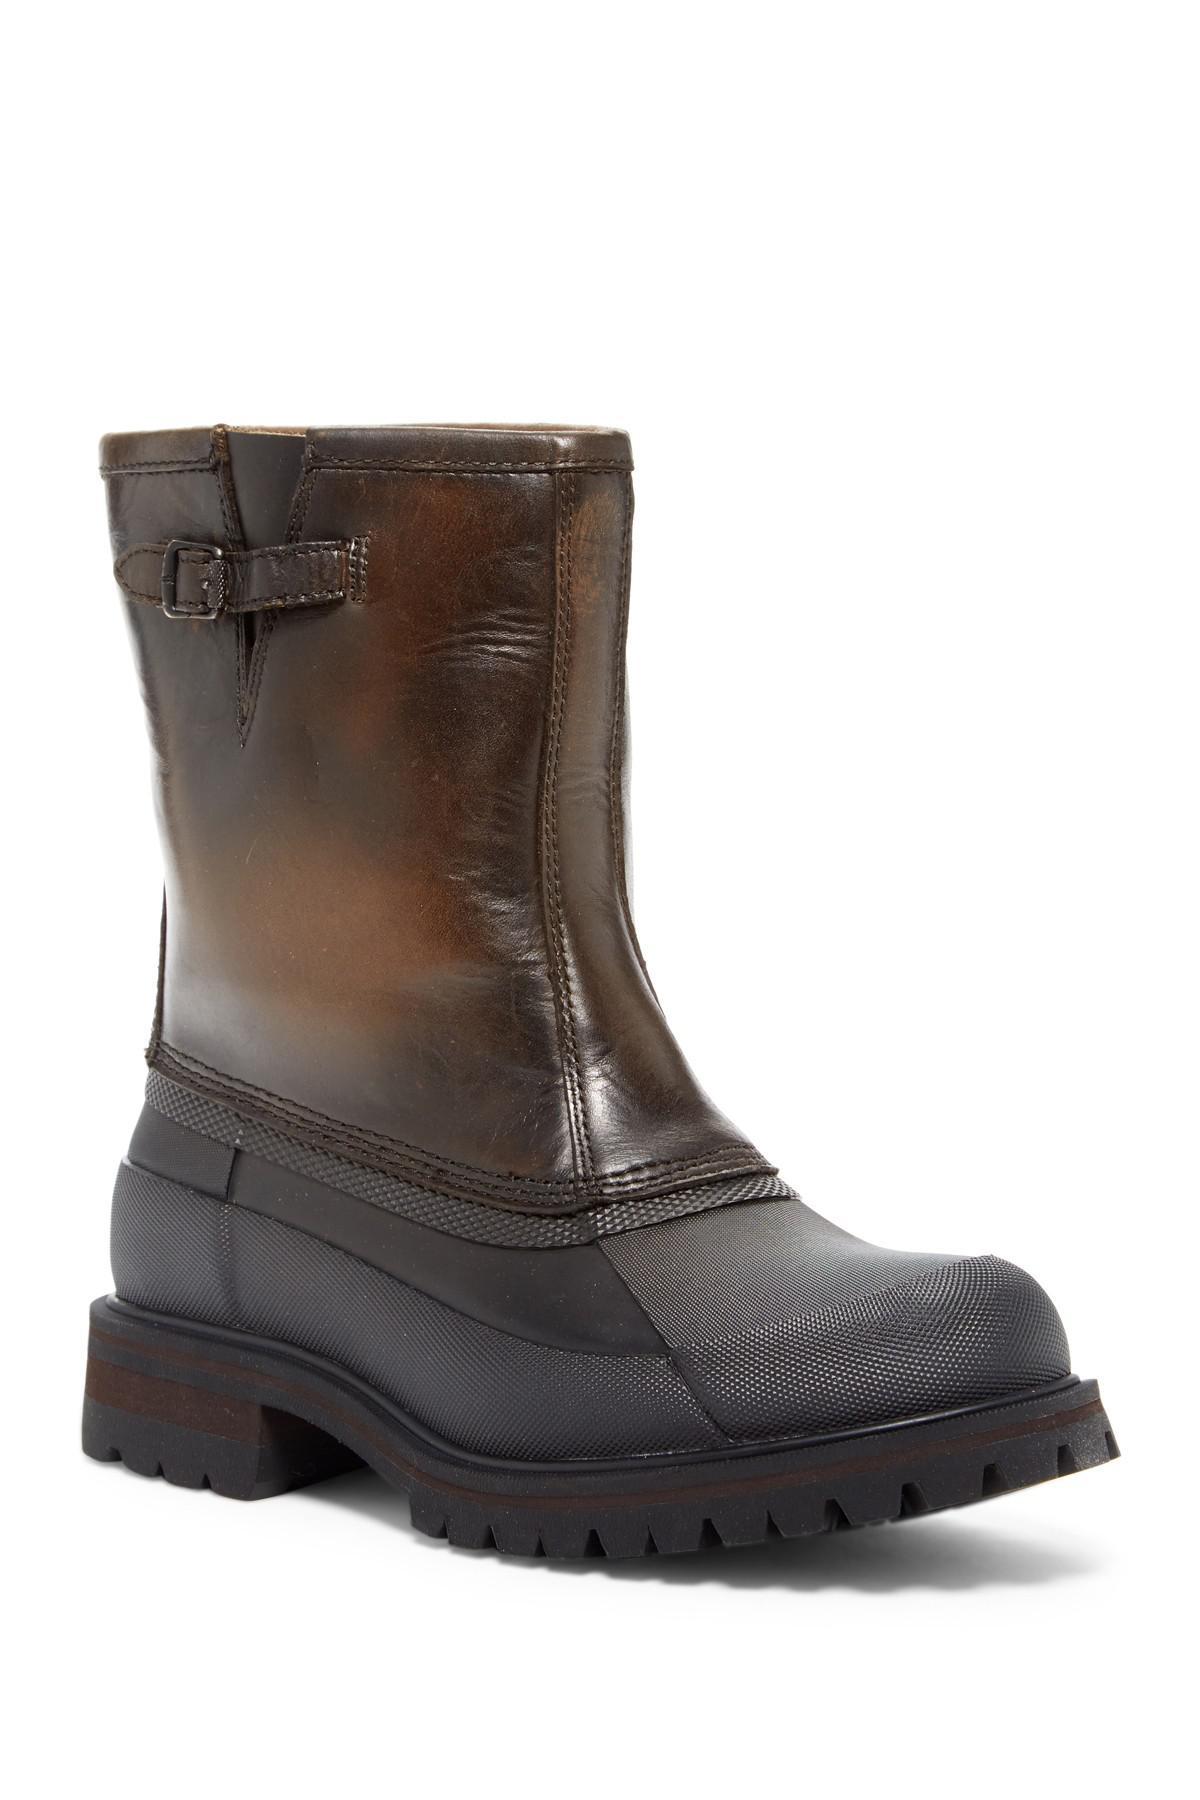 Alaska Boots Waterproof